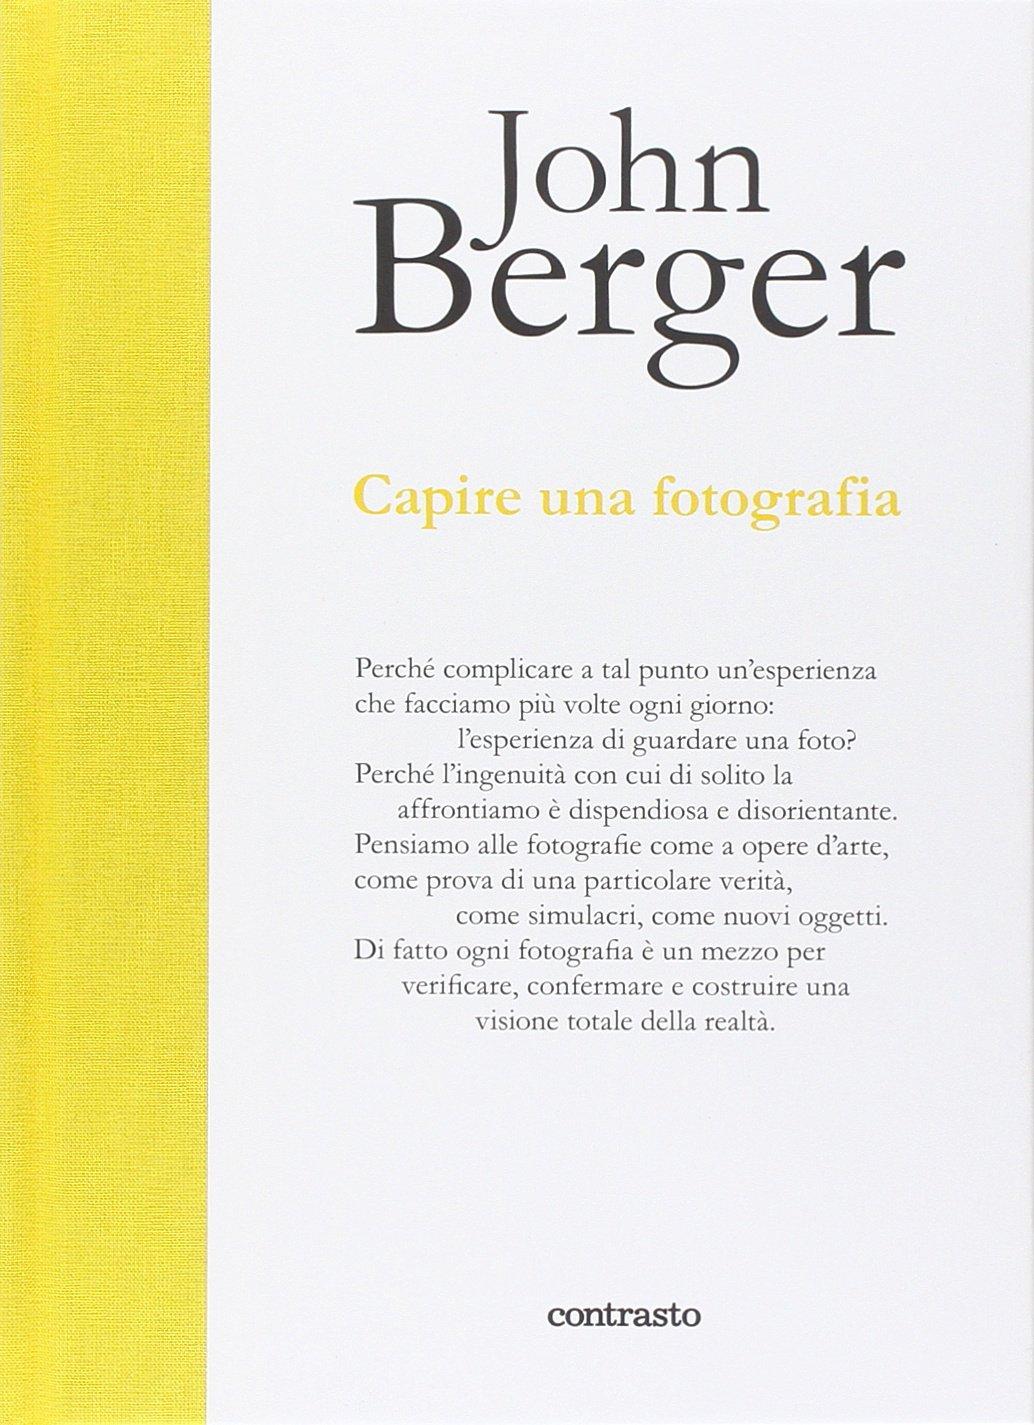 Capire una fotografia Copertina rigida – 2 ott 2014 John Berger G. Dyer M. Nadotti Contrasto